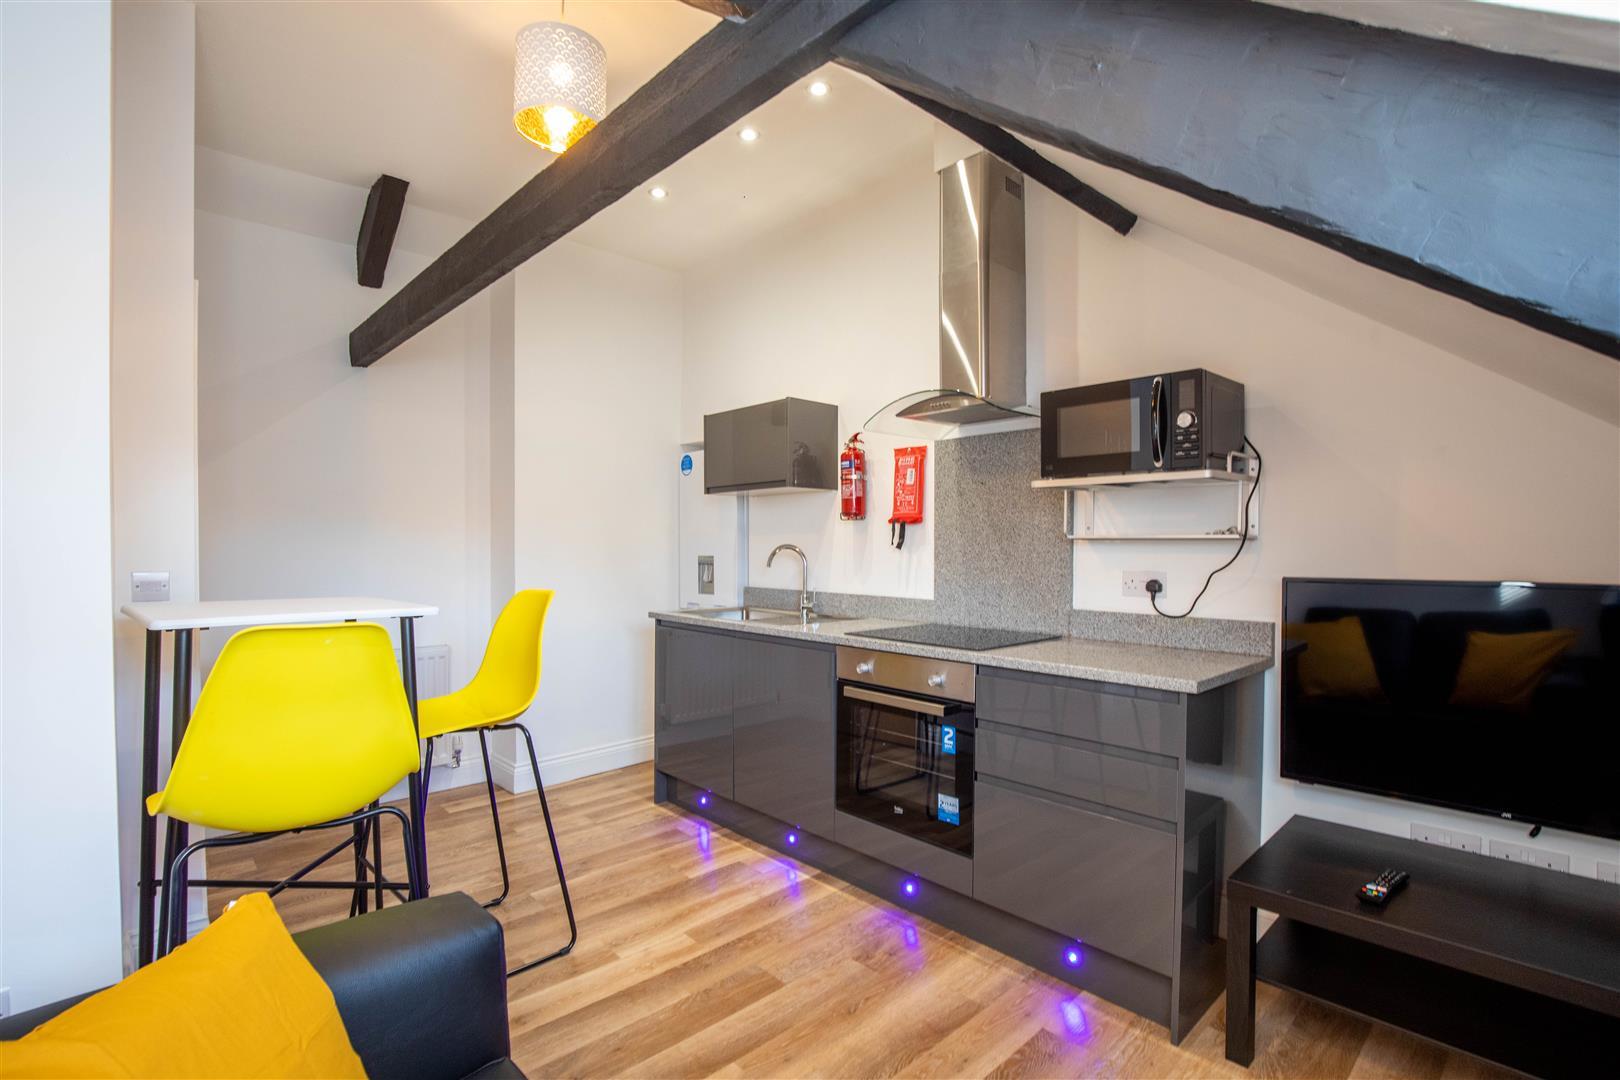 1 bed apartment to rent in Newcastle Upon Tyne, NE1 8JN, NE1